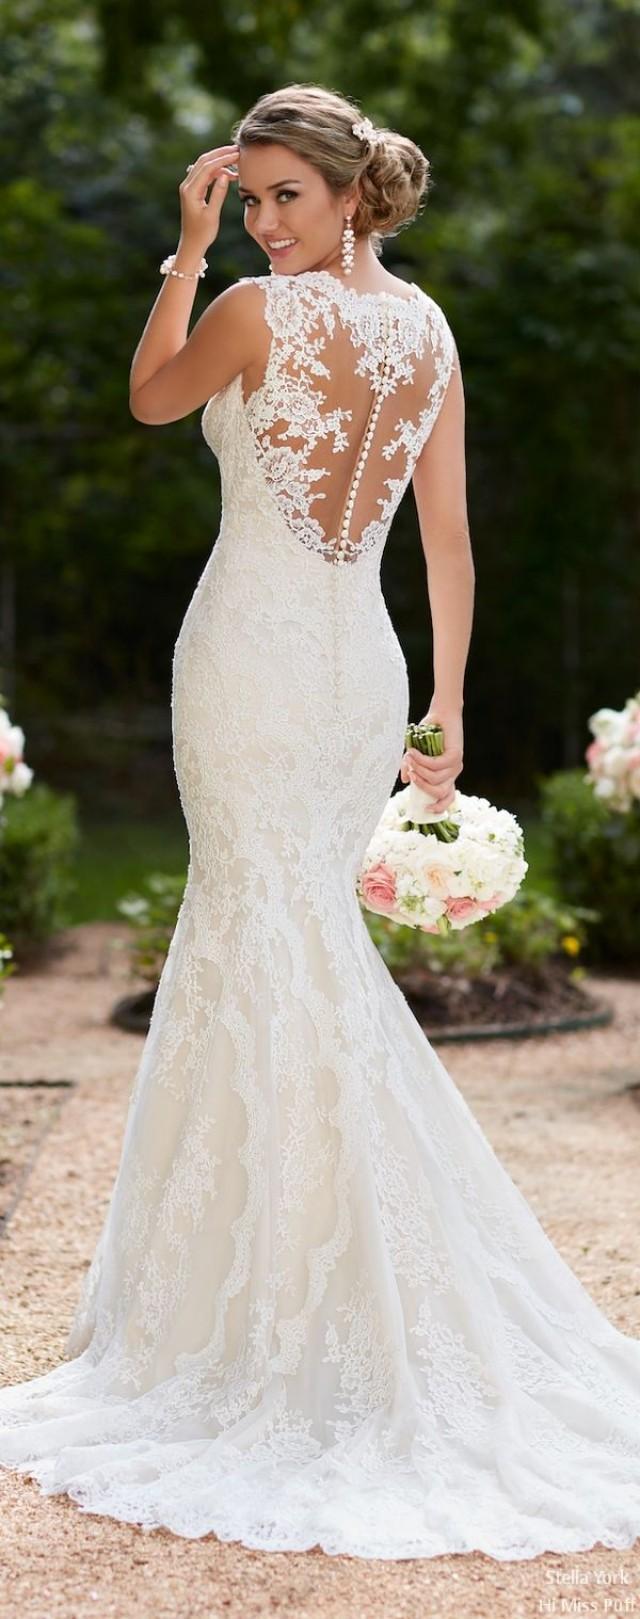 Dress - Stella York Wedding Dresses 2017 #2707493 - Weddbook